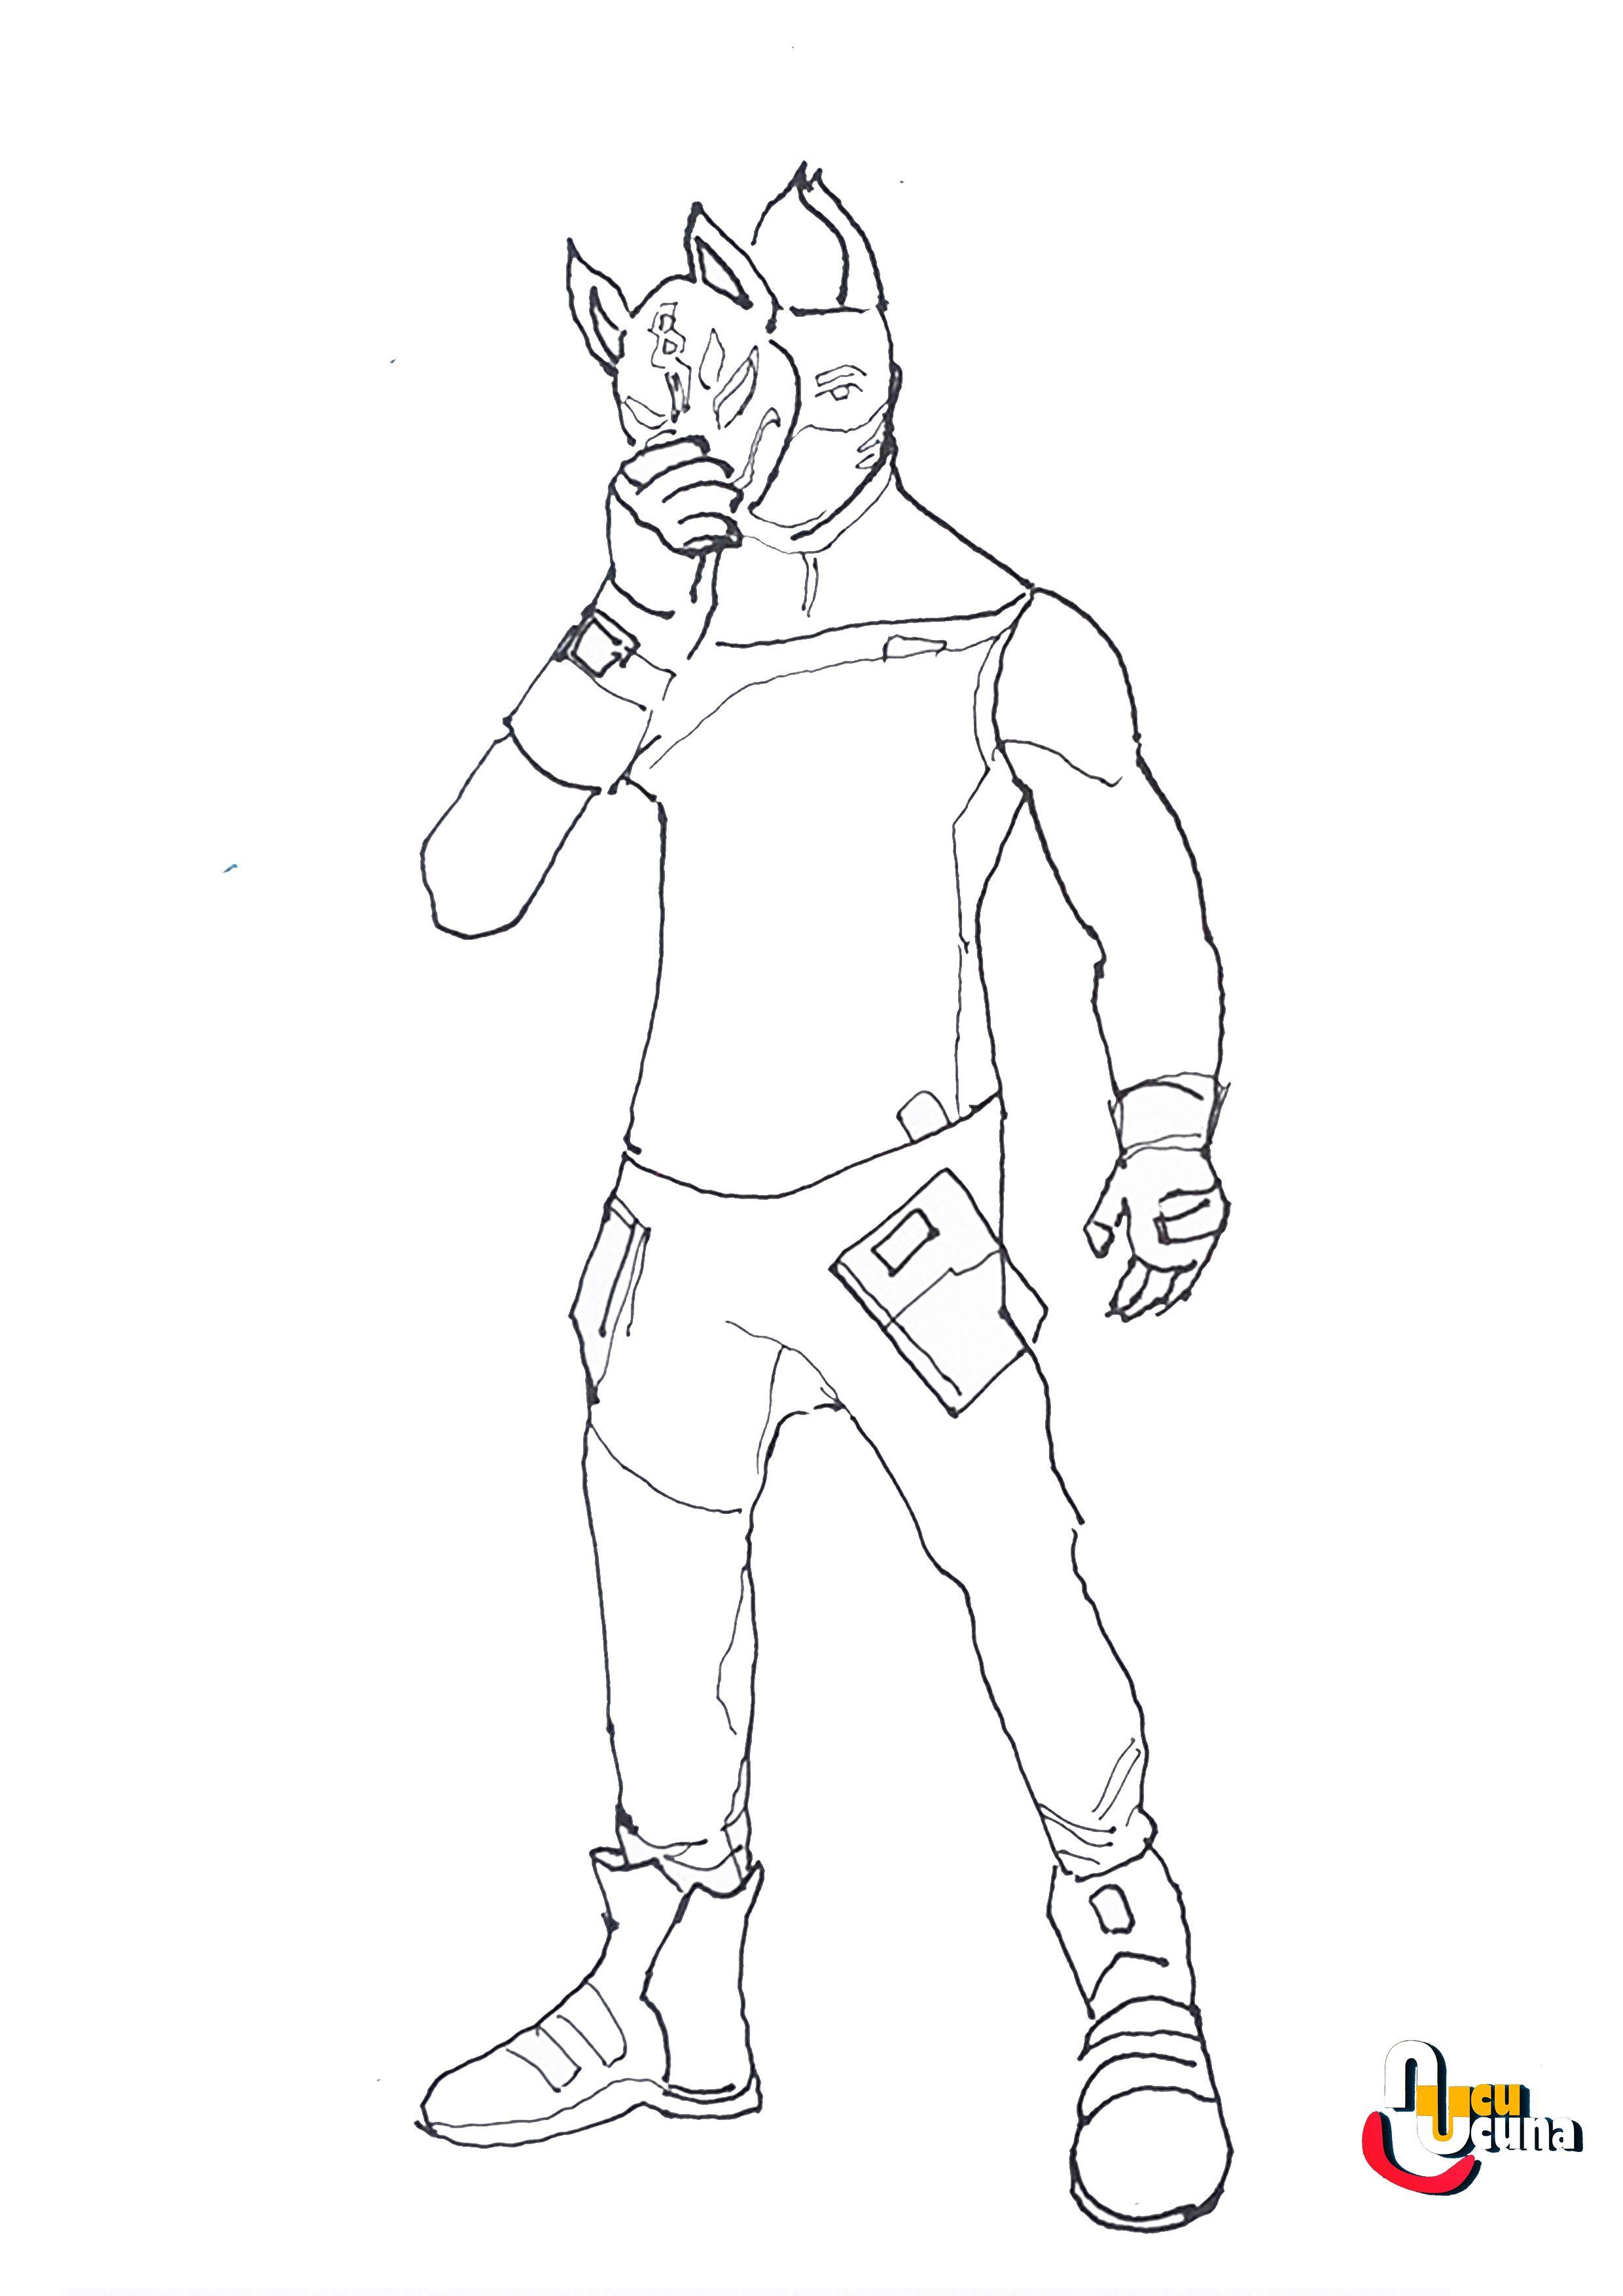 Drift Fortnite Draw Basic Step By Step Beginner Drawing Tutorial